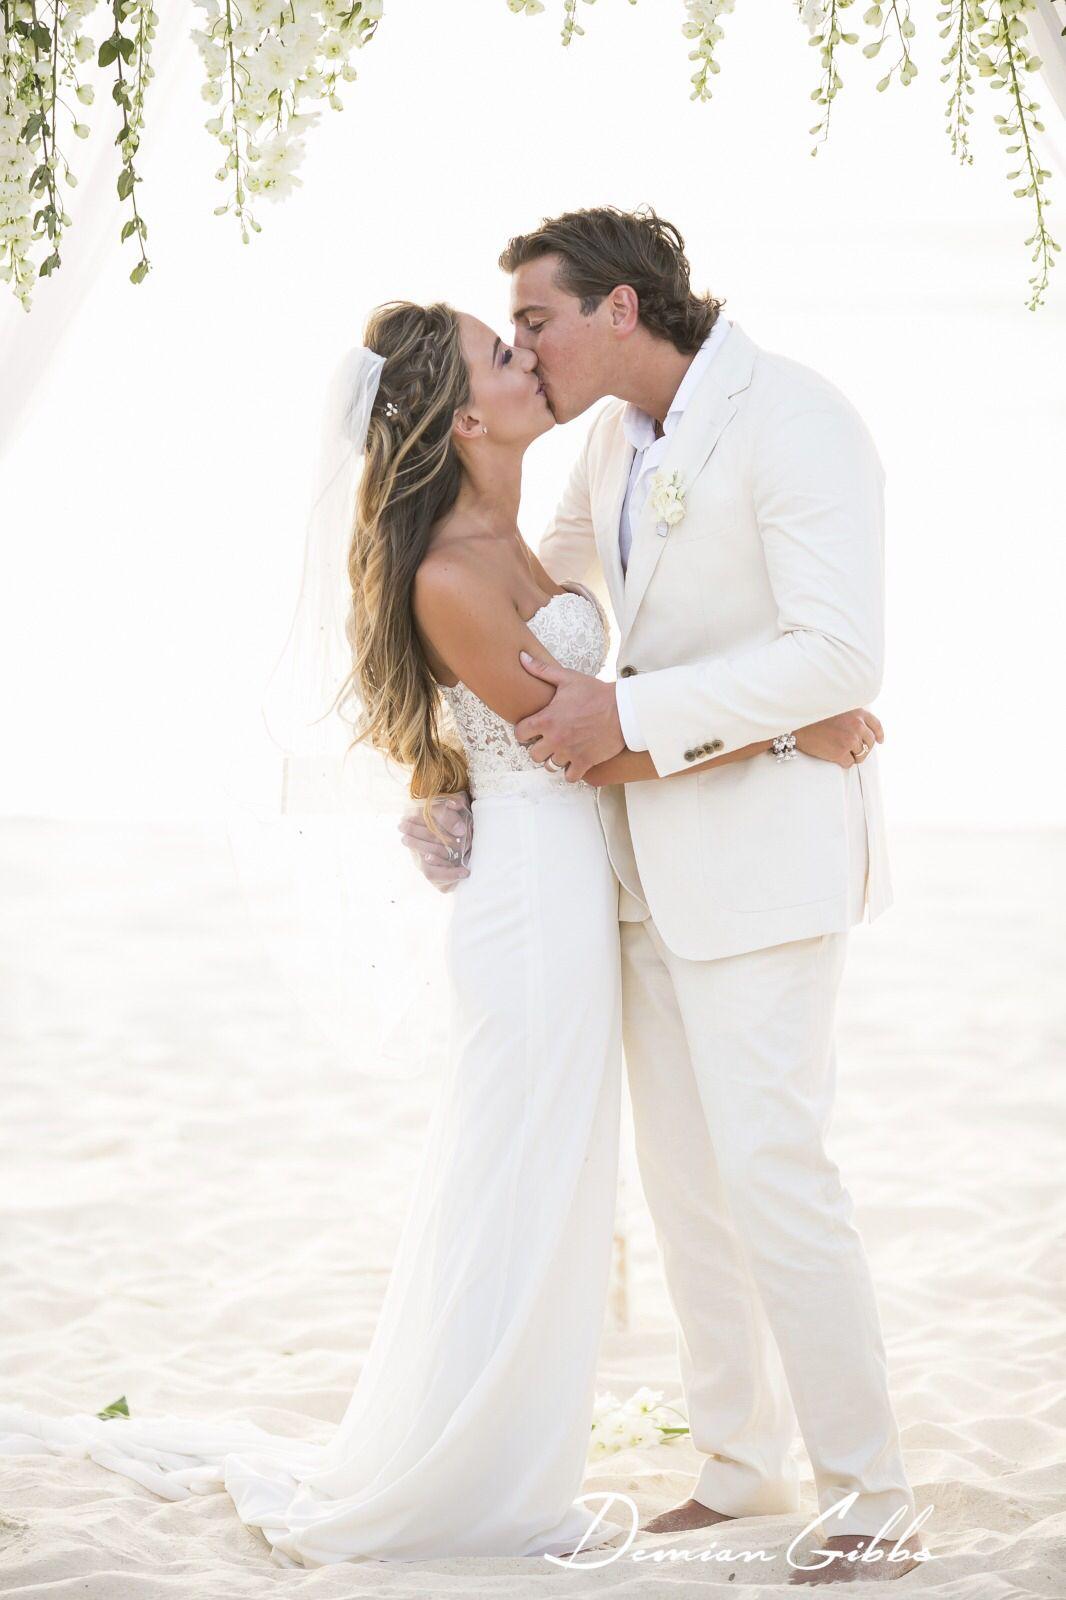 Beach wedding kiss wedding ideas pinterest wedding kiss beach